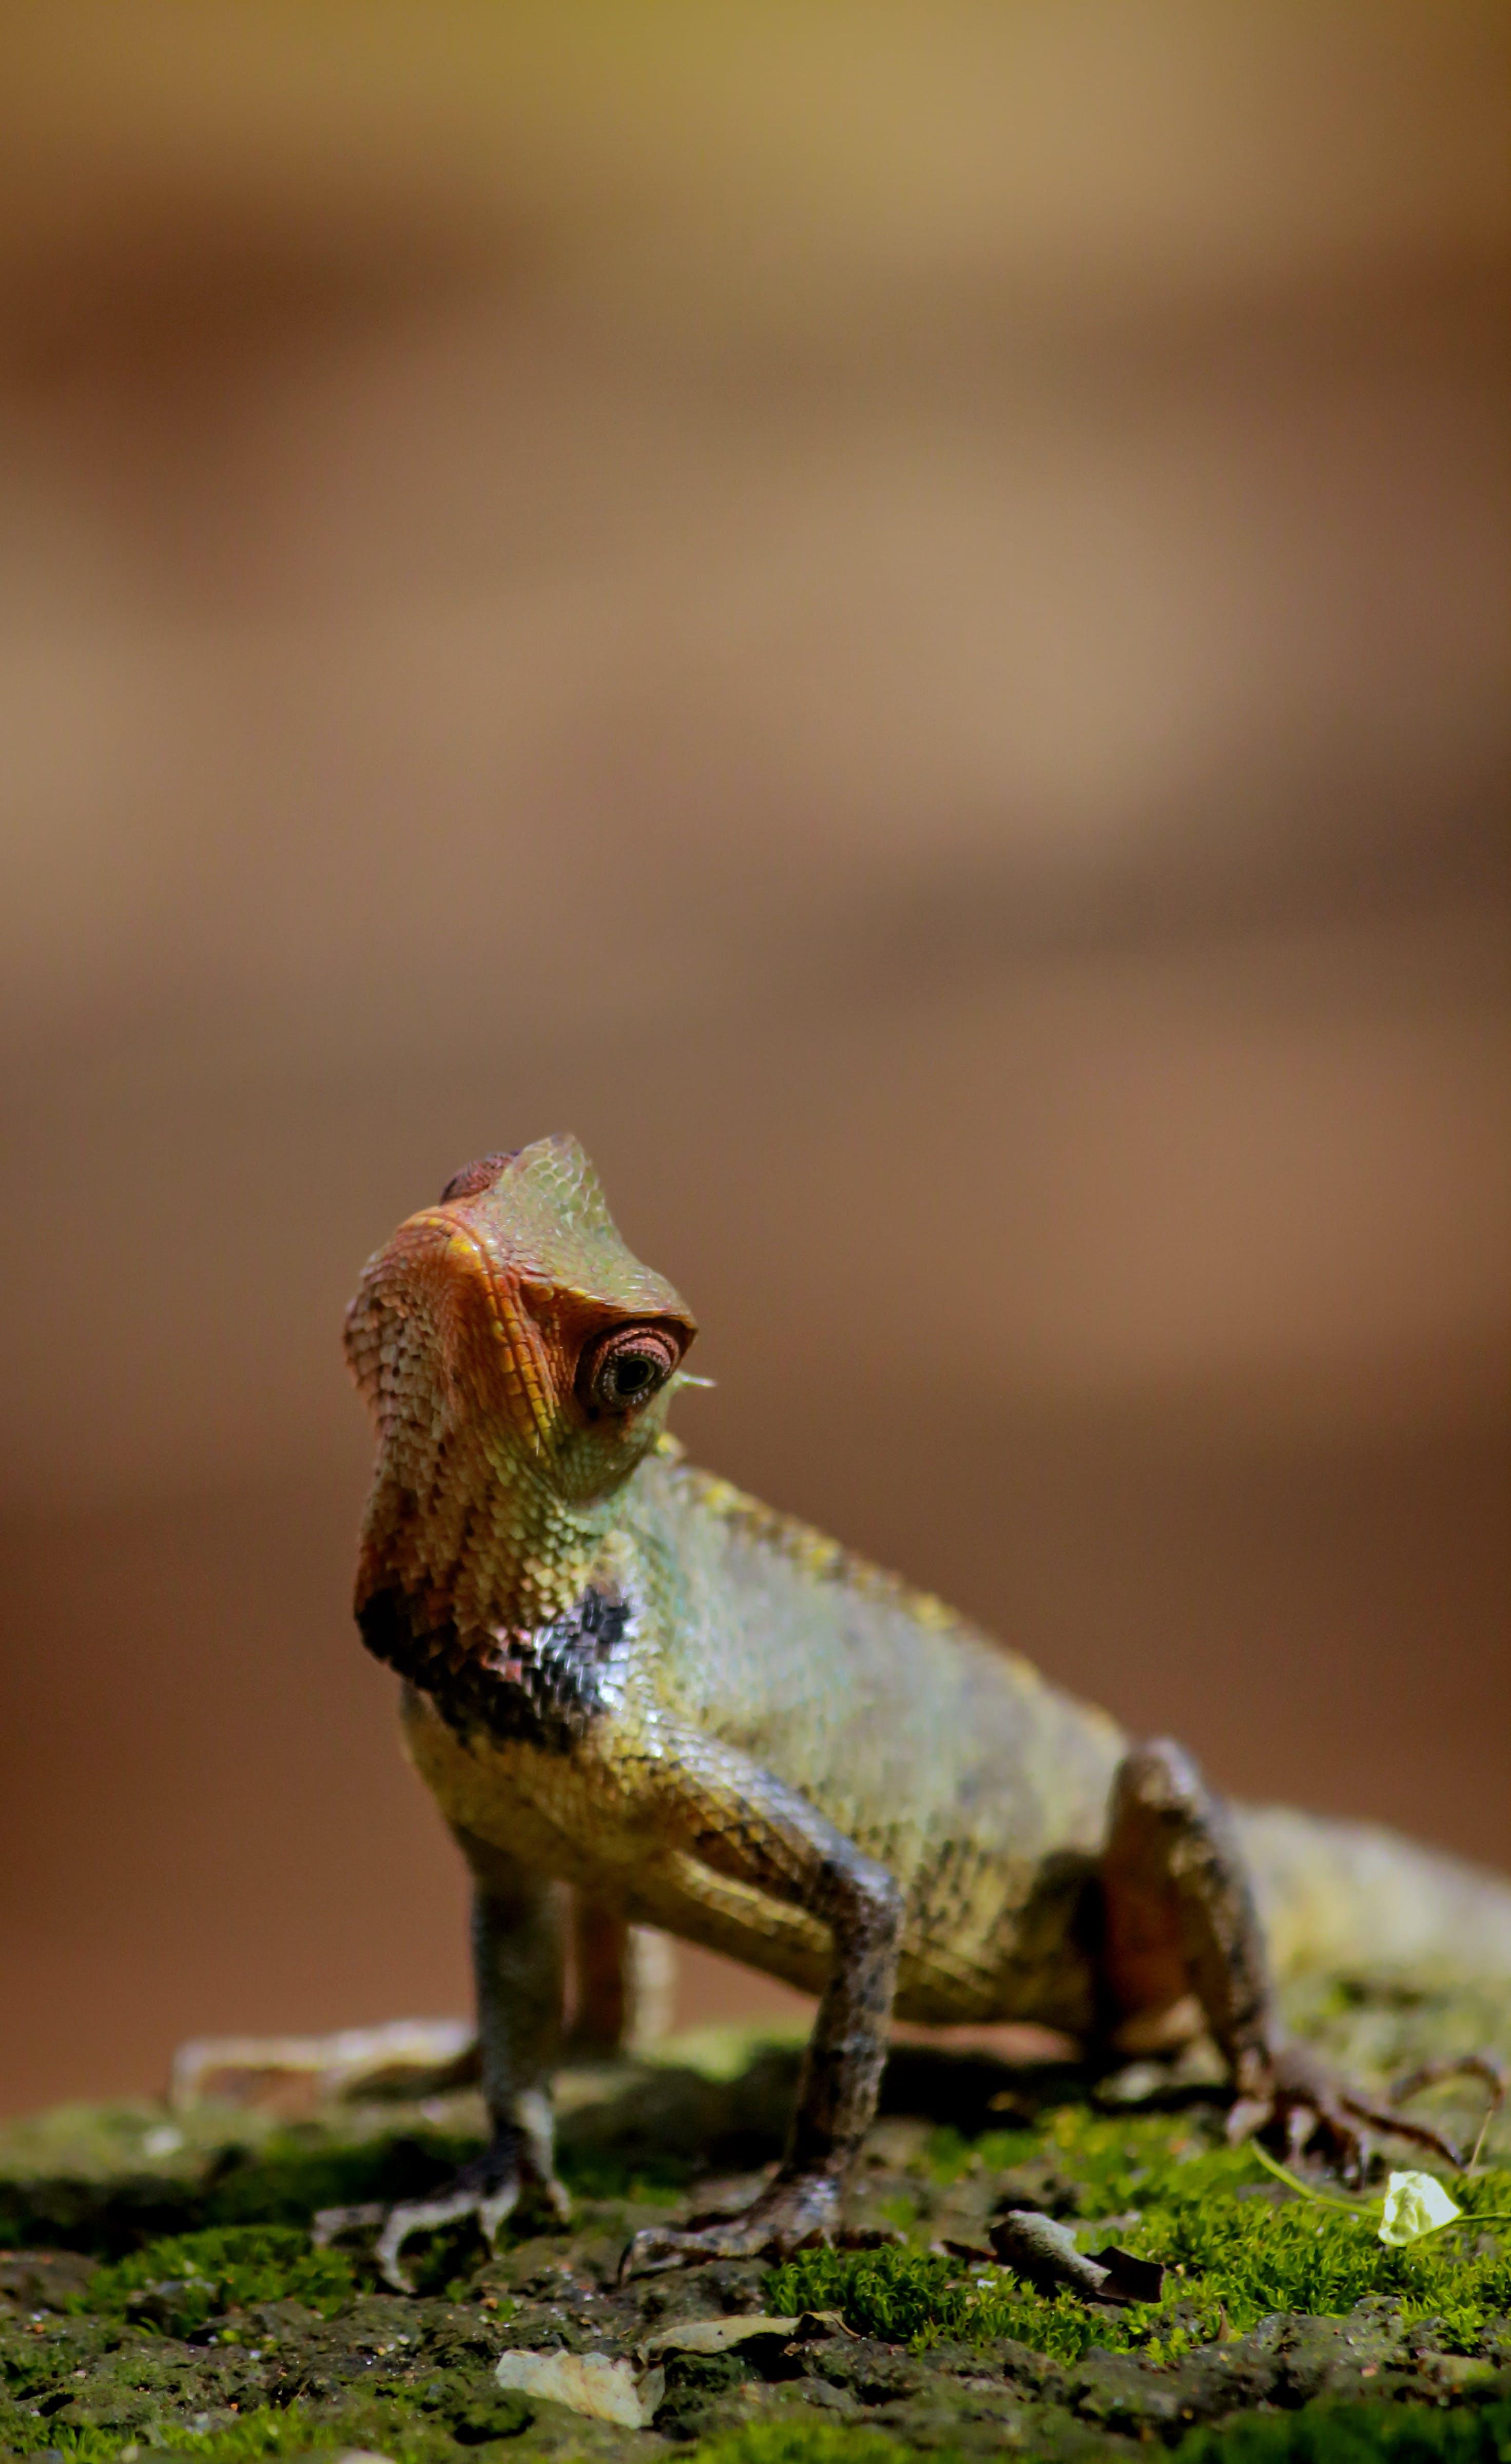 Free stock photo of animal, animal world, brown, chameleon